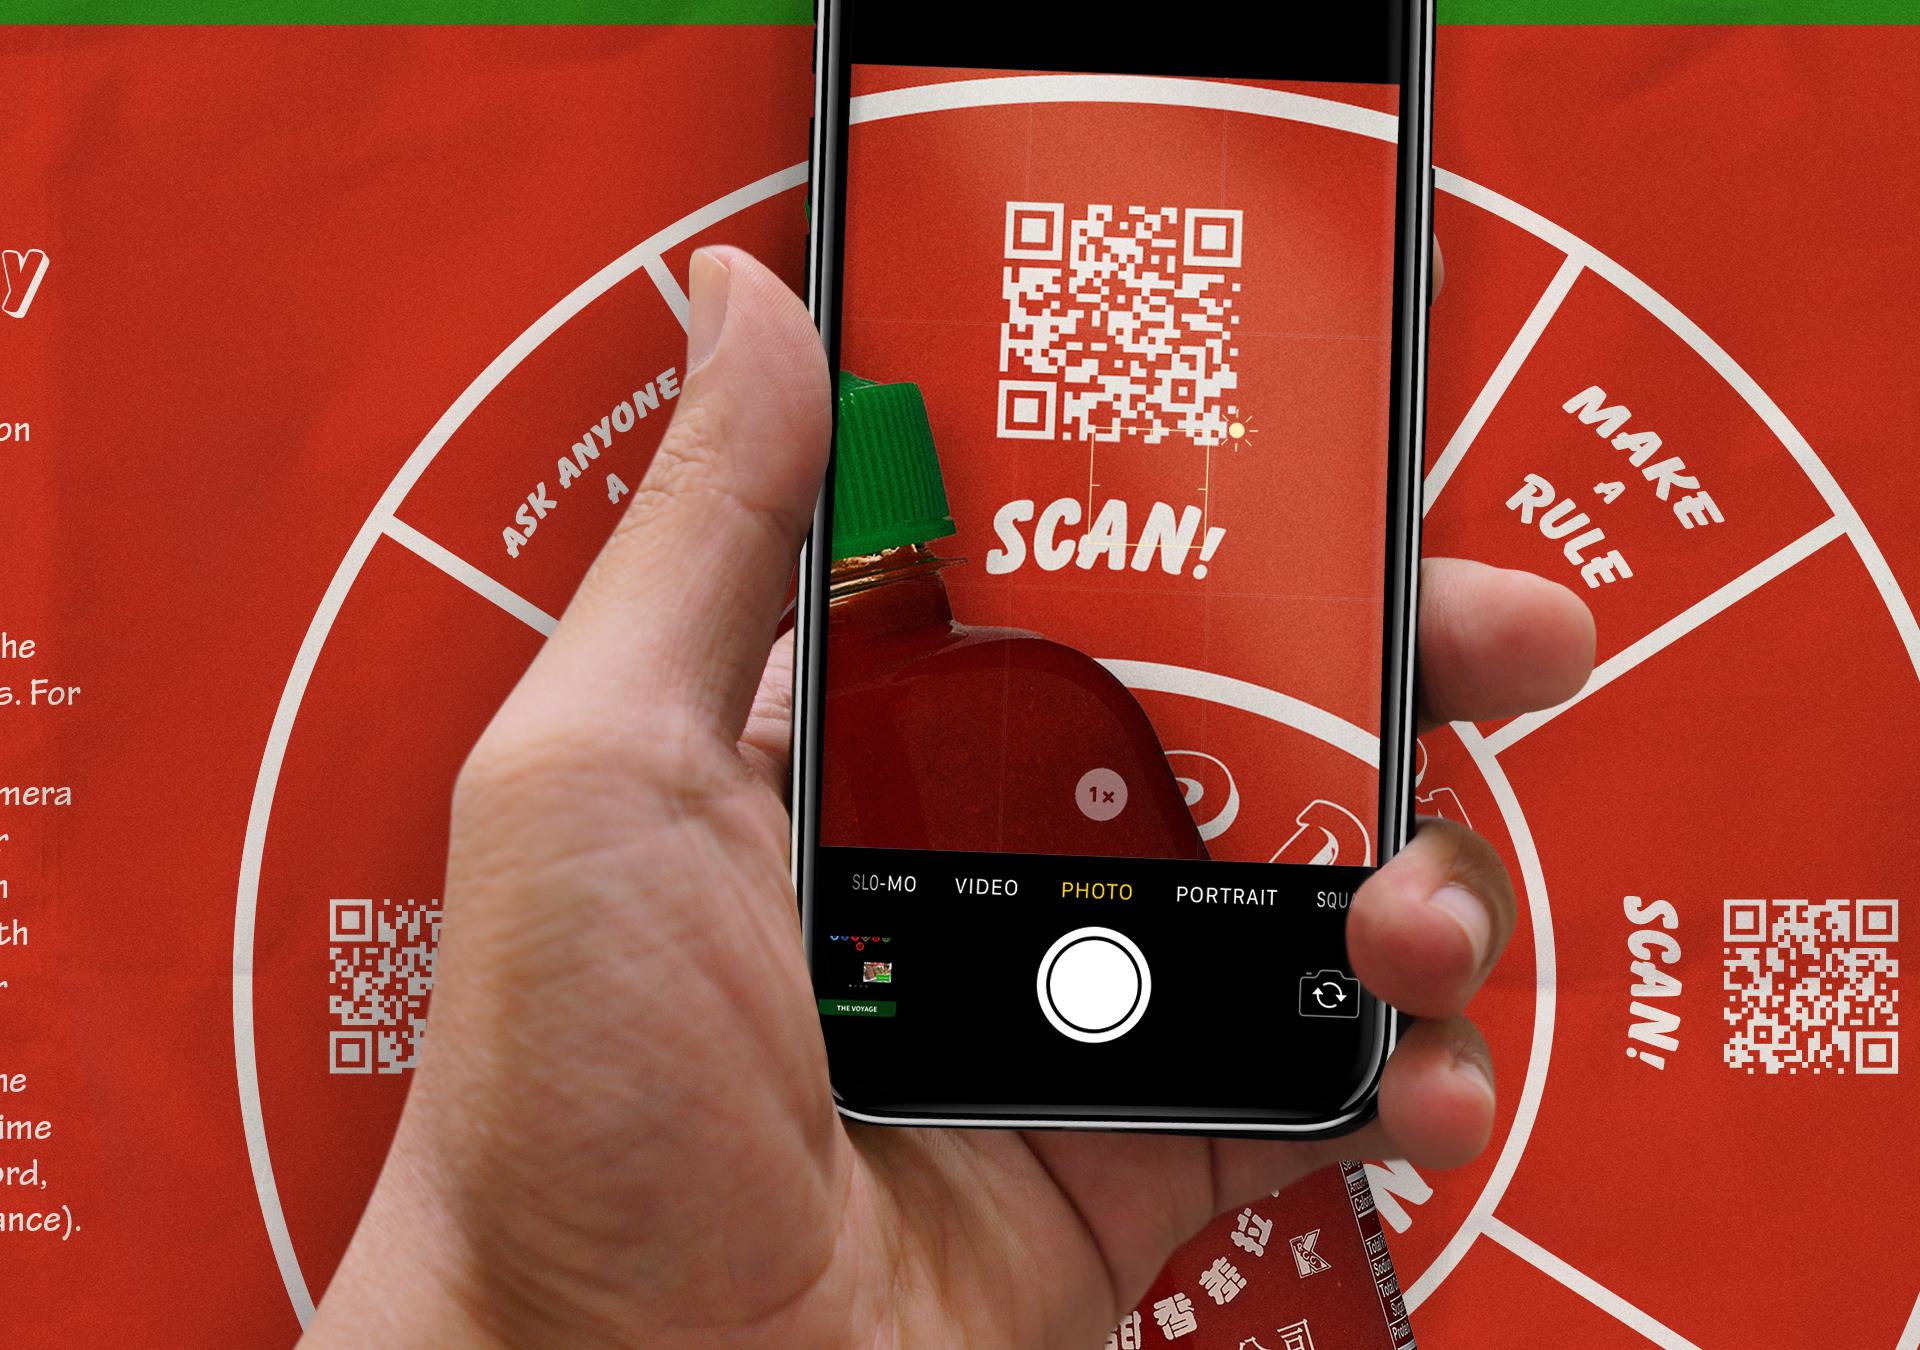 Scanning-With-Sriracha.jpg